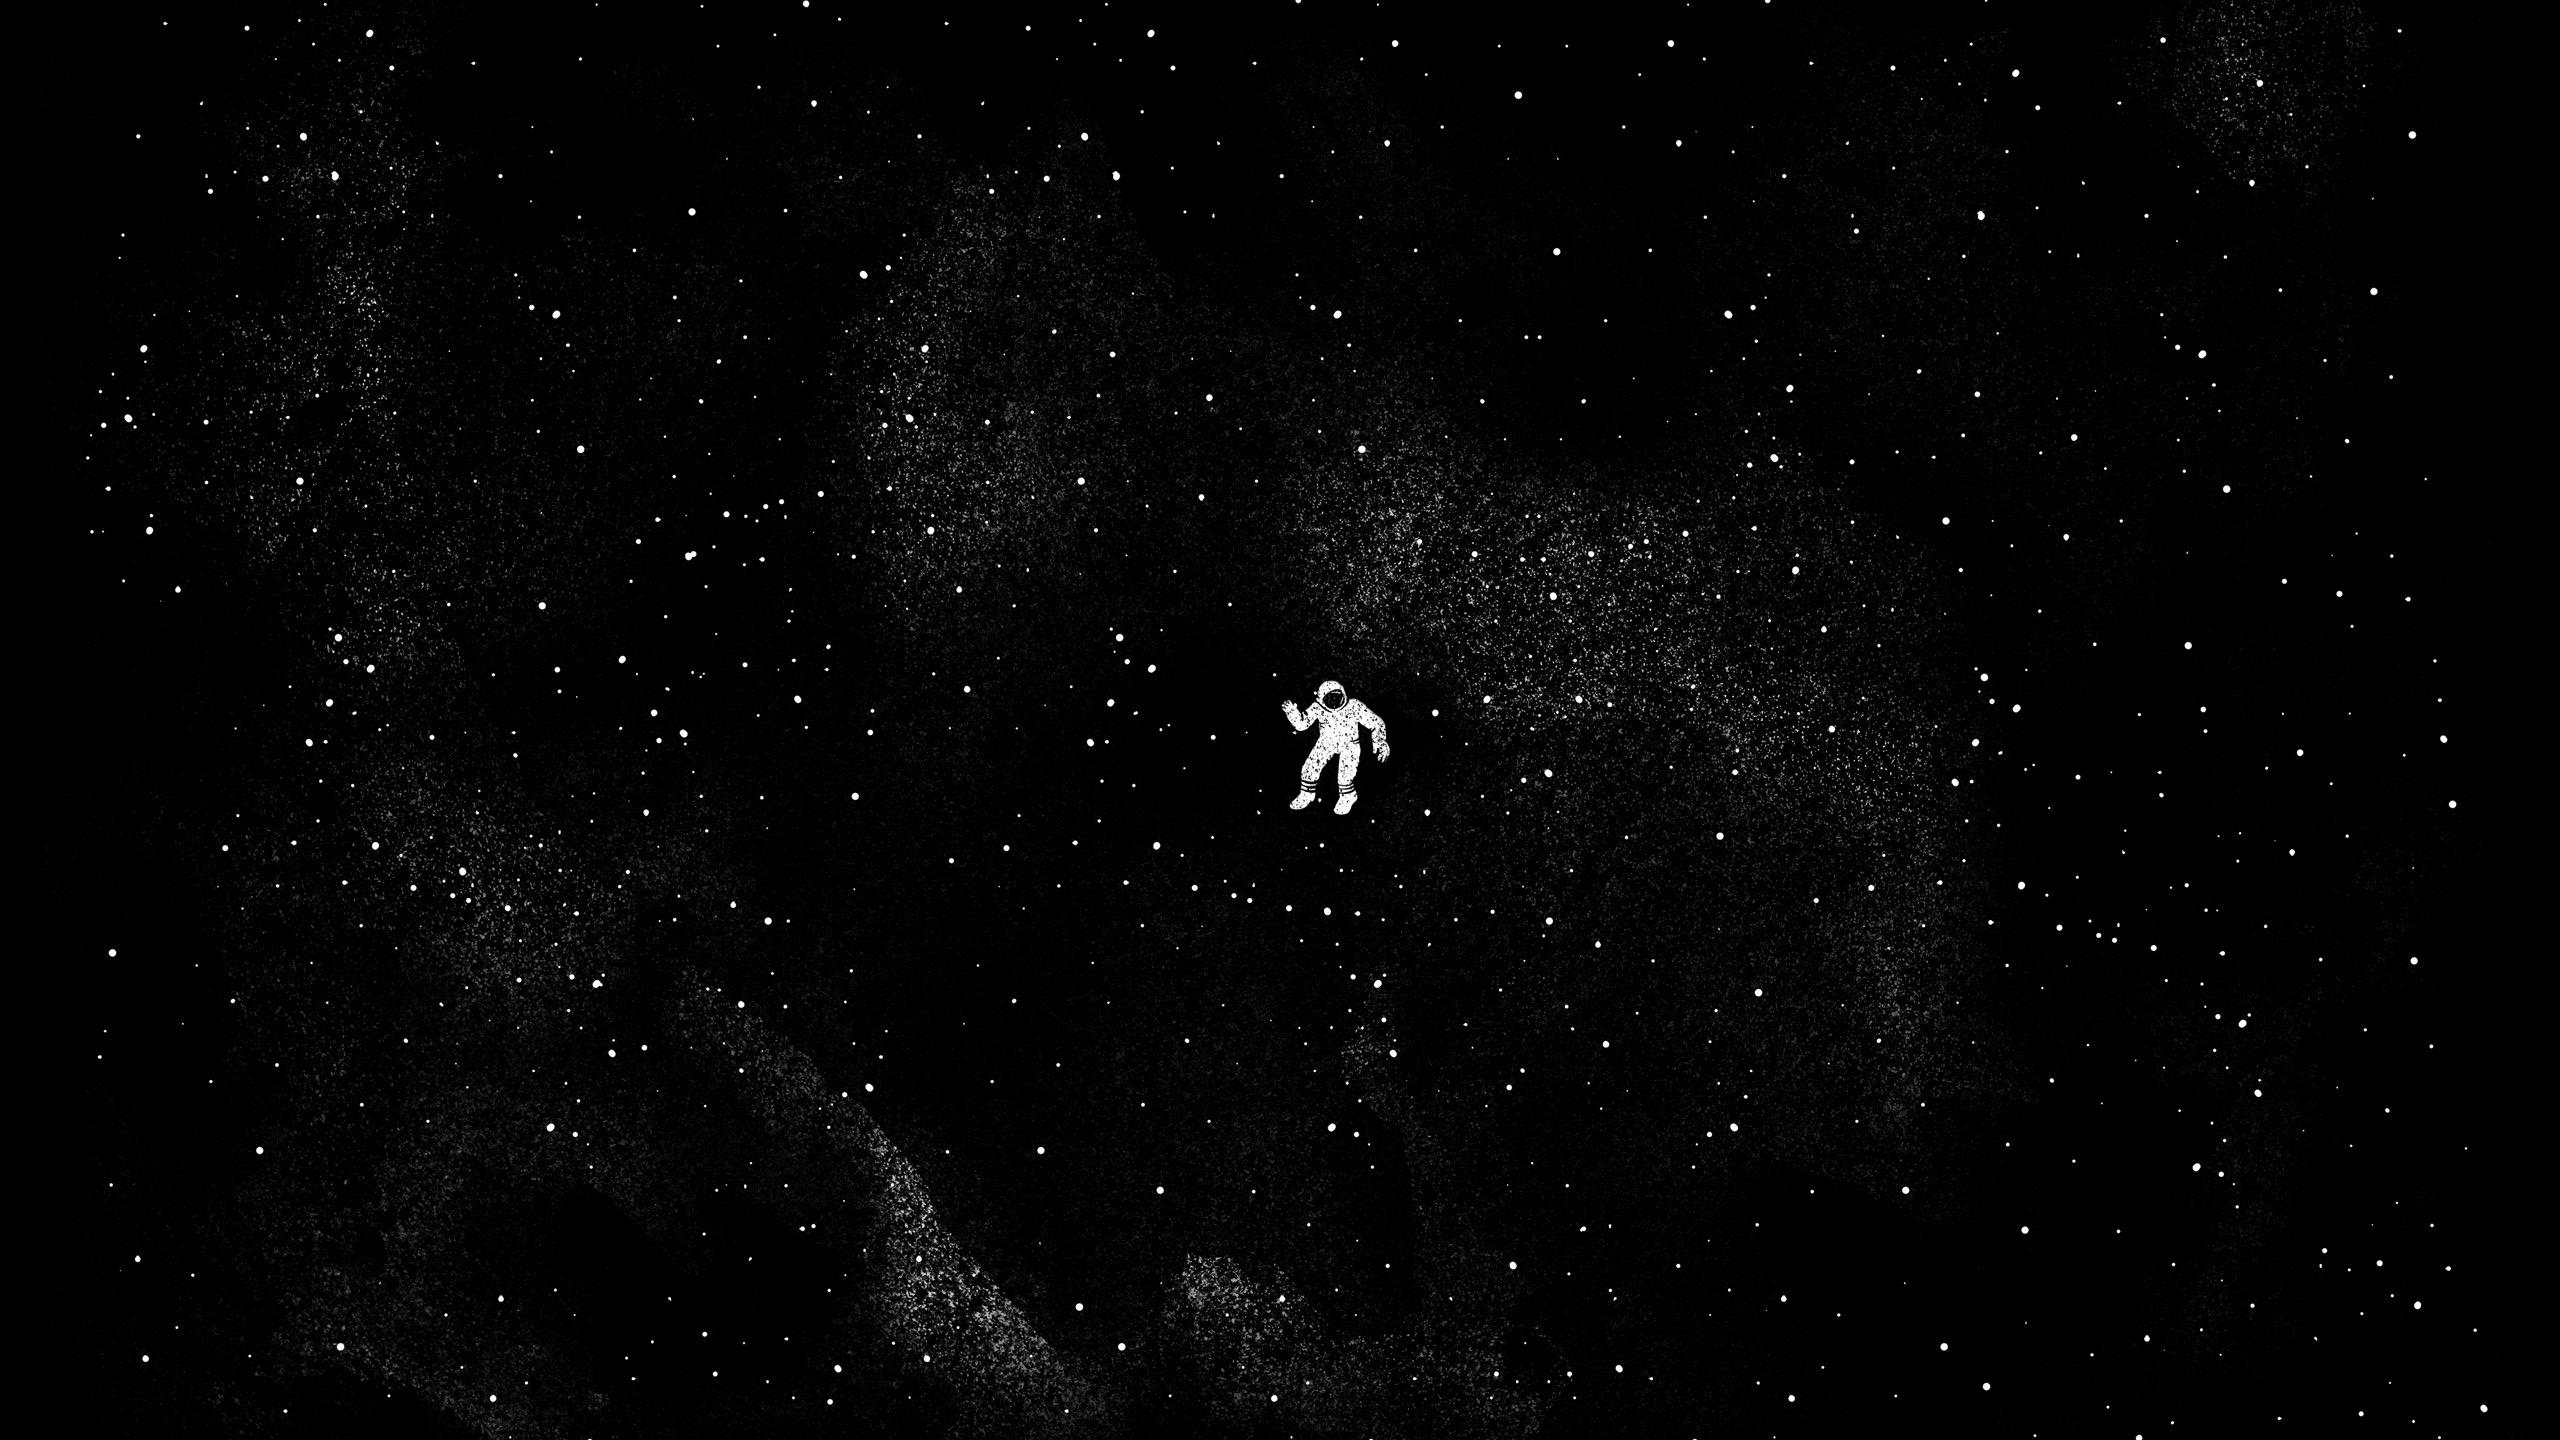 Wallpaper Astronaut Floating Monochrome Space Stars Nebula 2560x1440 Mt4s 1881113 Hd Wallpapers Wallhere